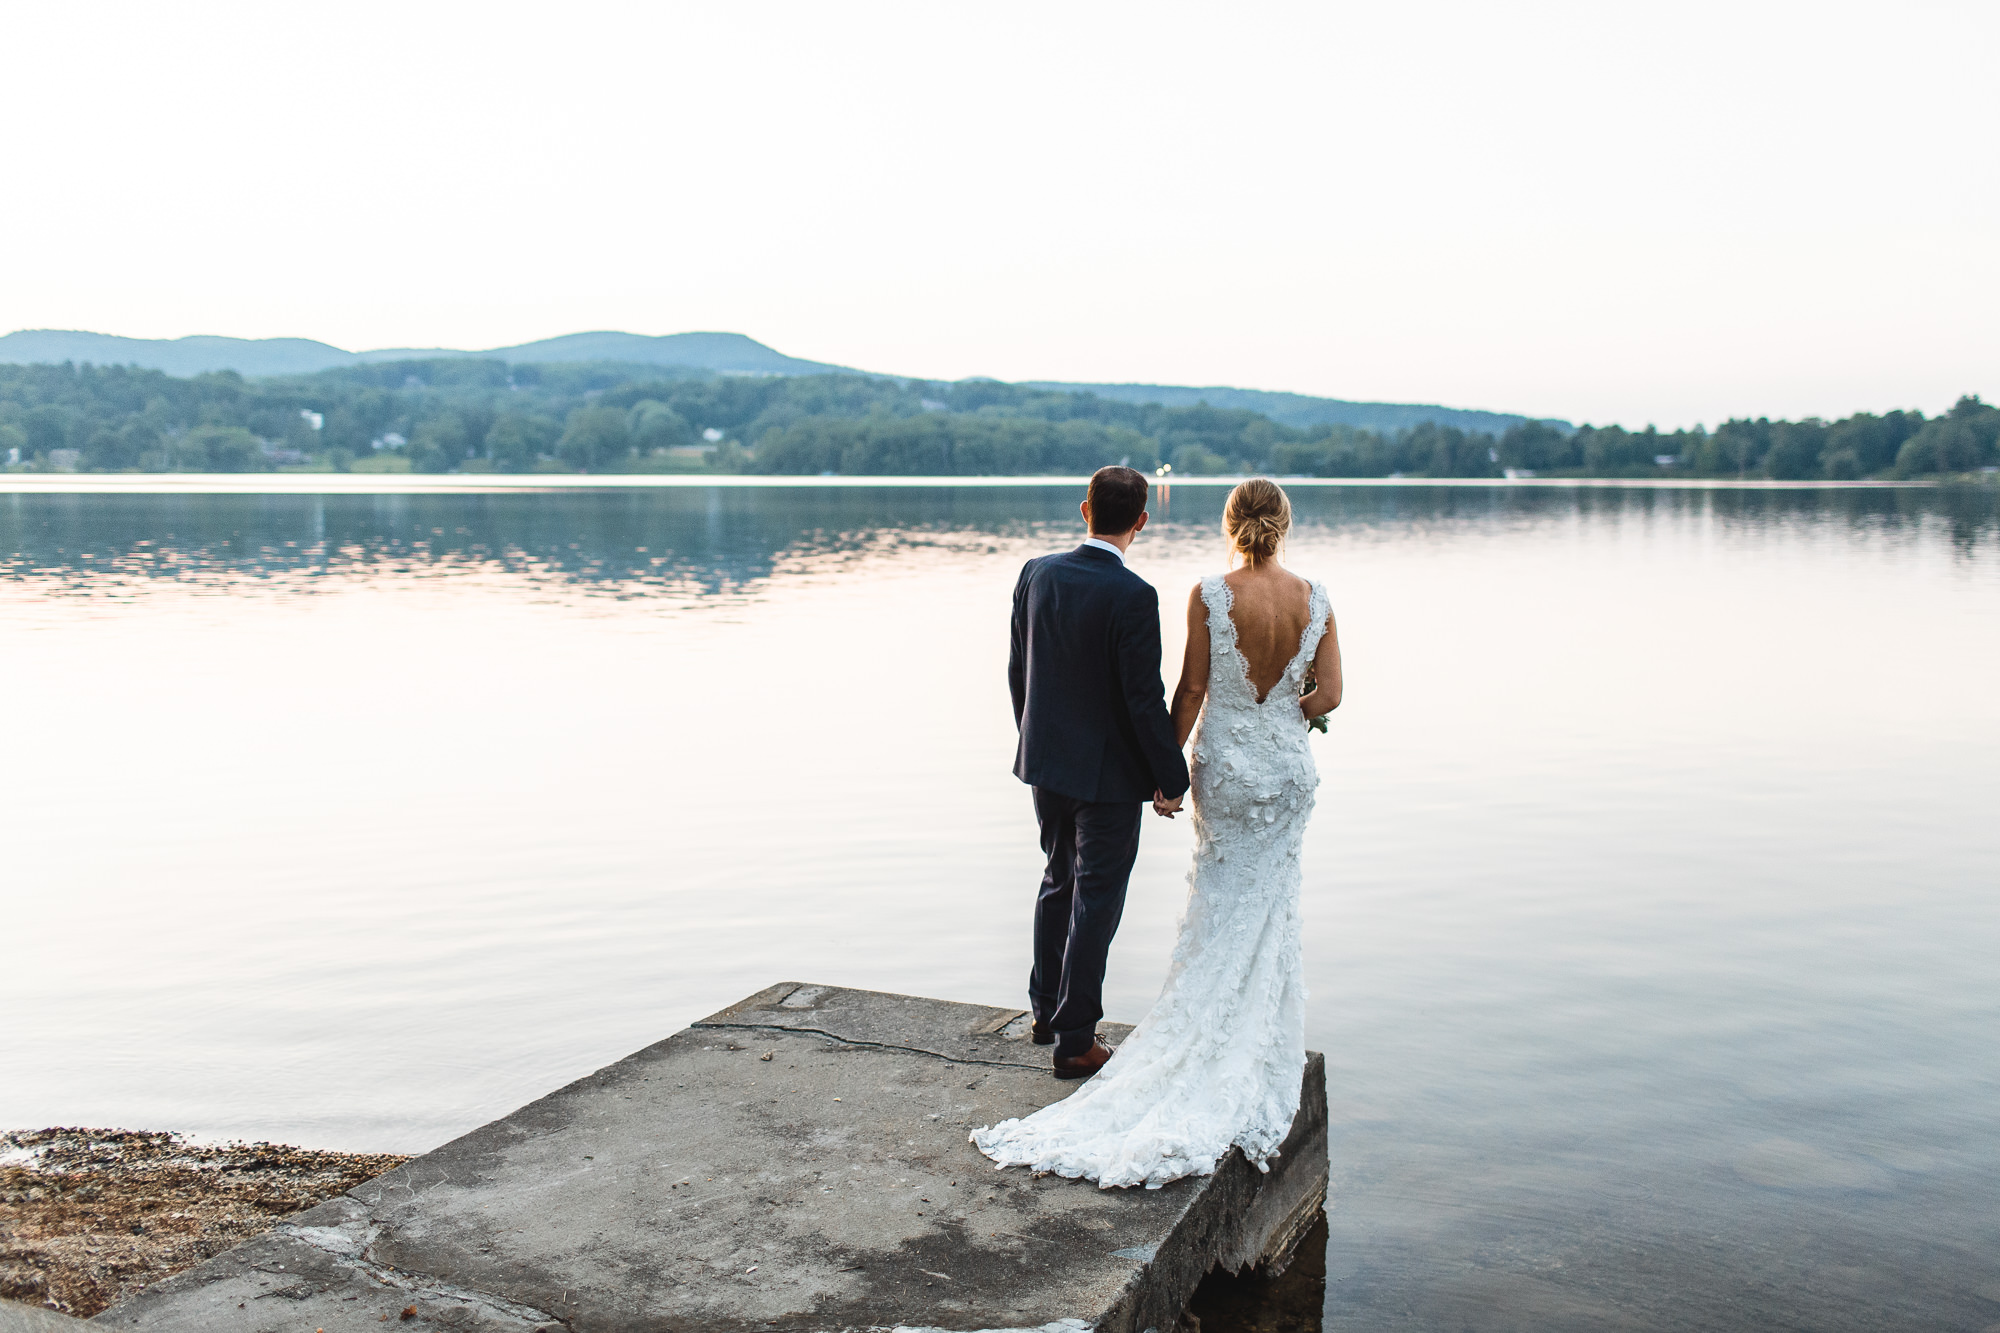 connecticut-summer-lake-wedding-emily-kirke-photography-upstyle (161 of 181).jpg